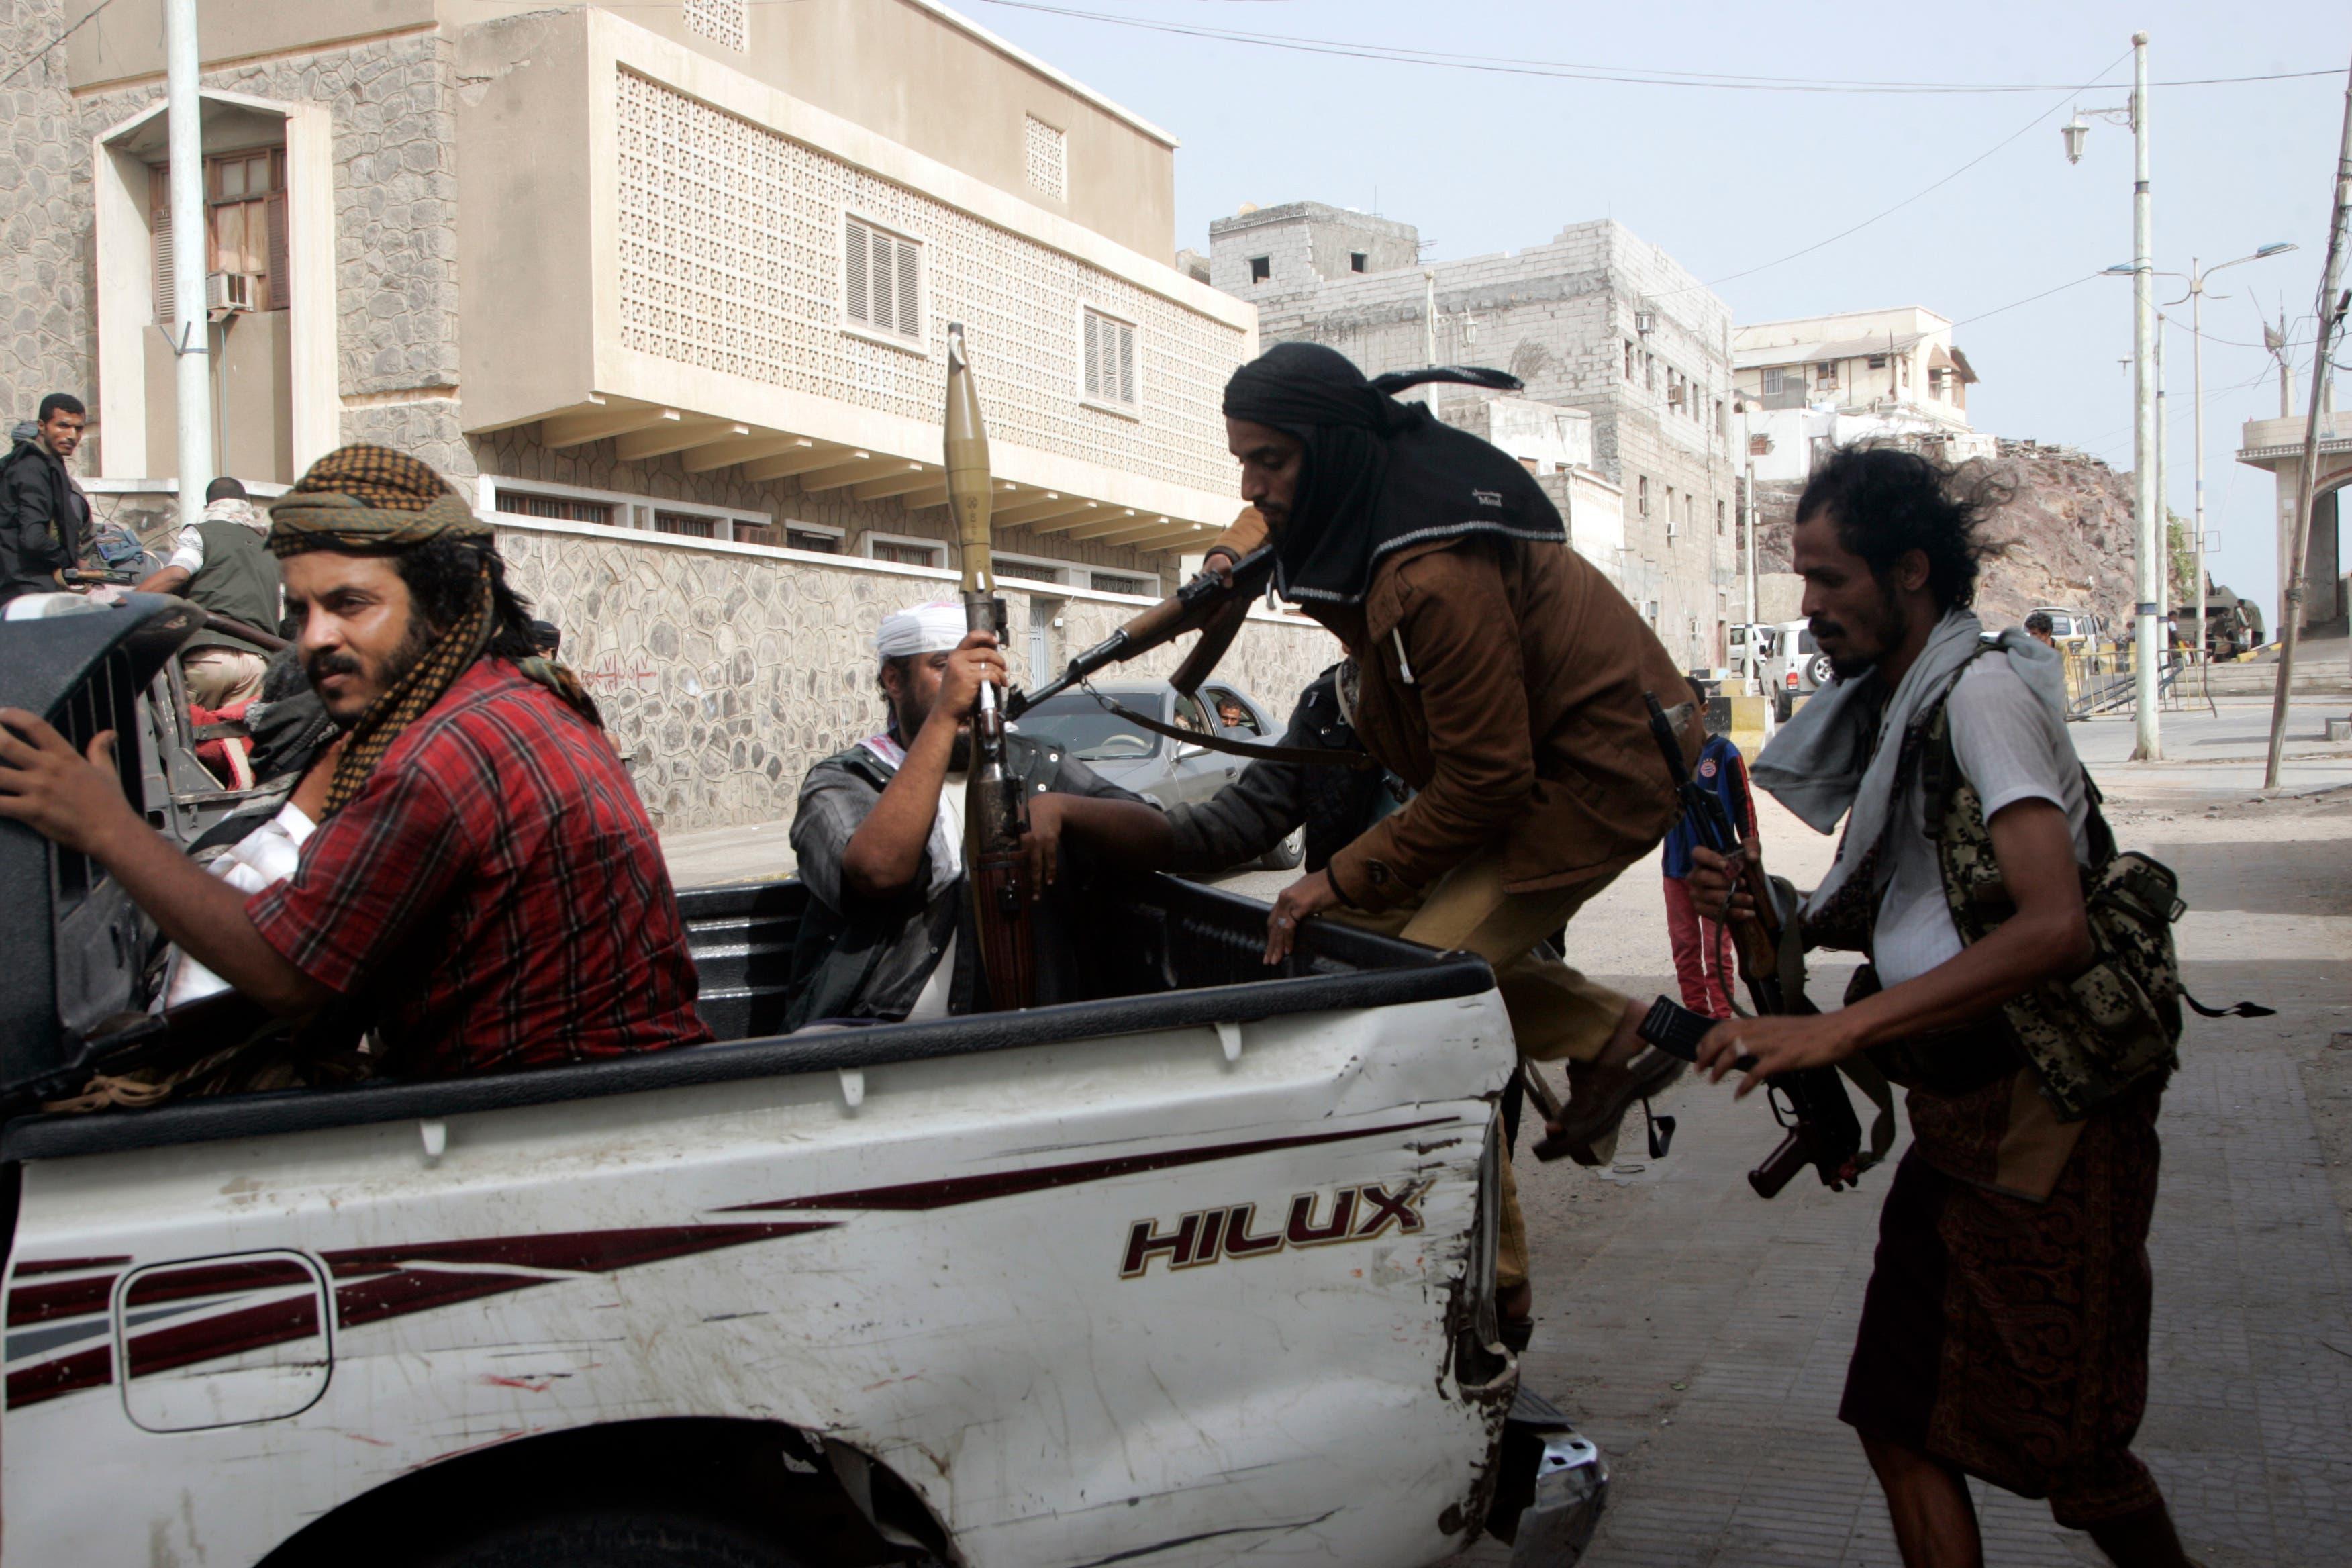 Turmoil escalates in Yemen